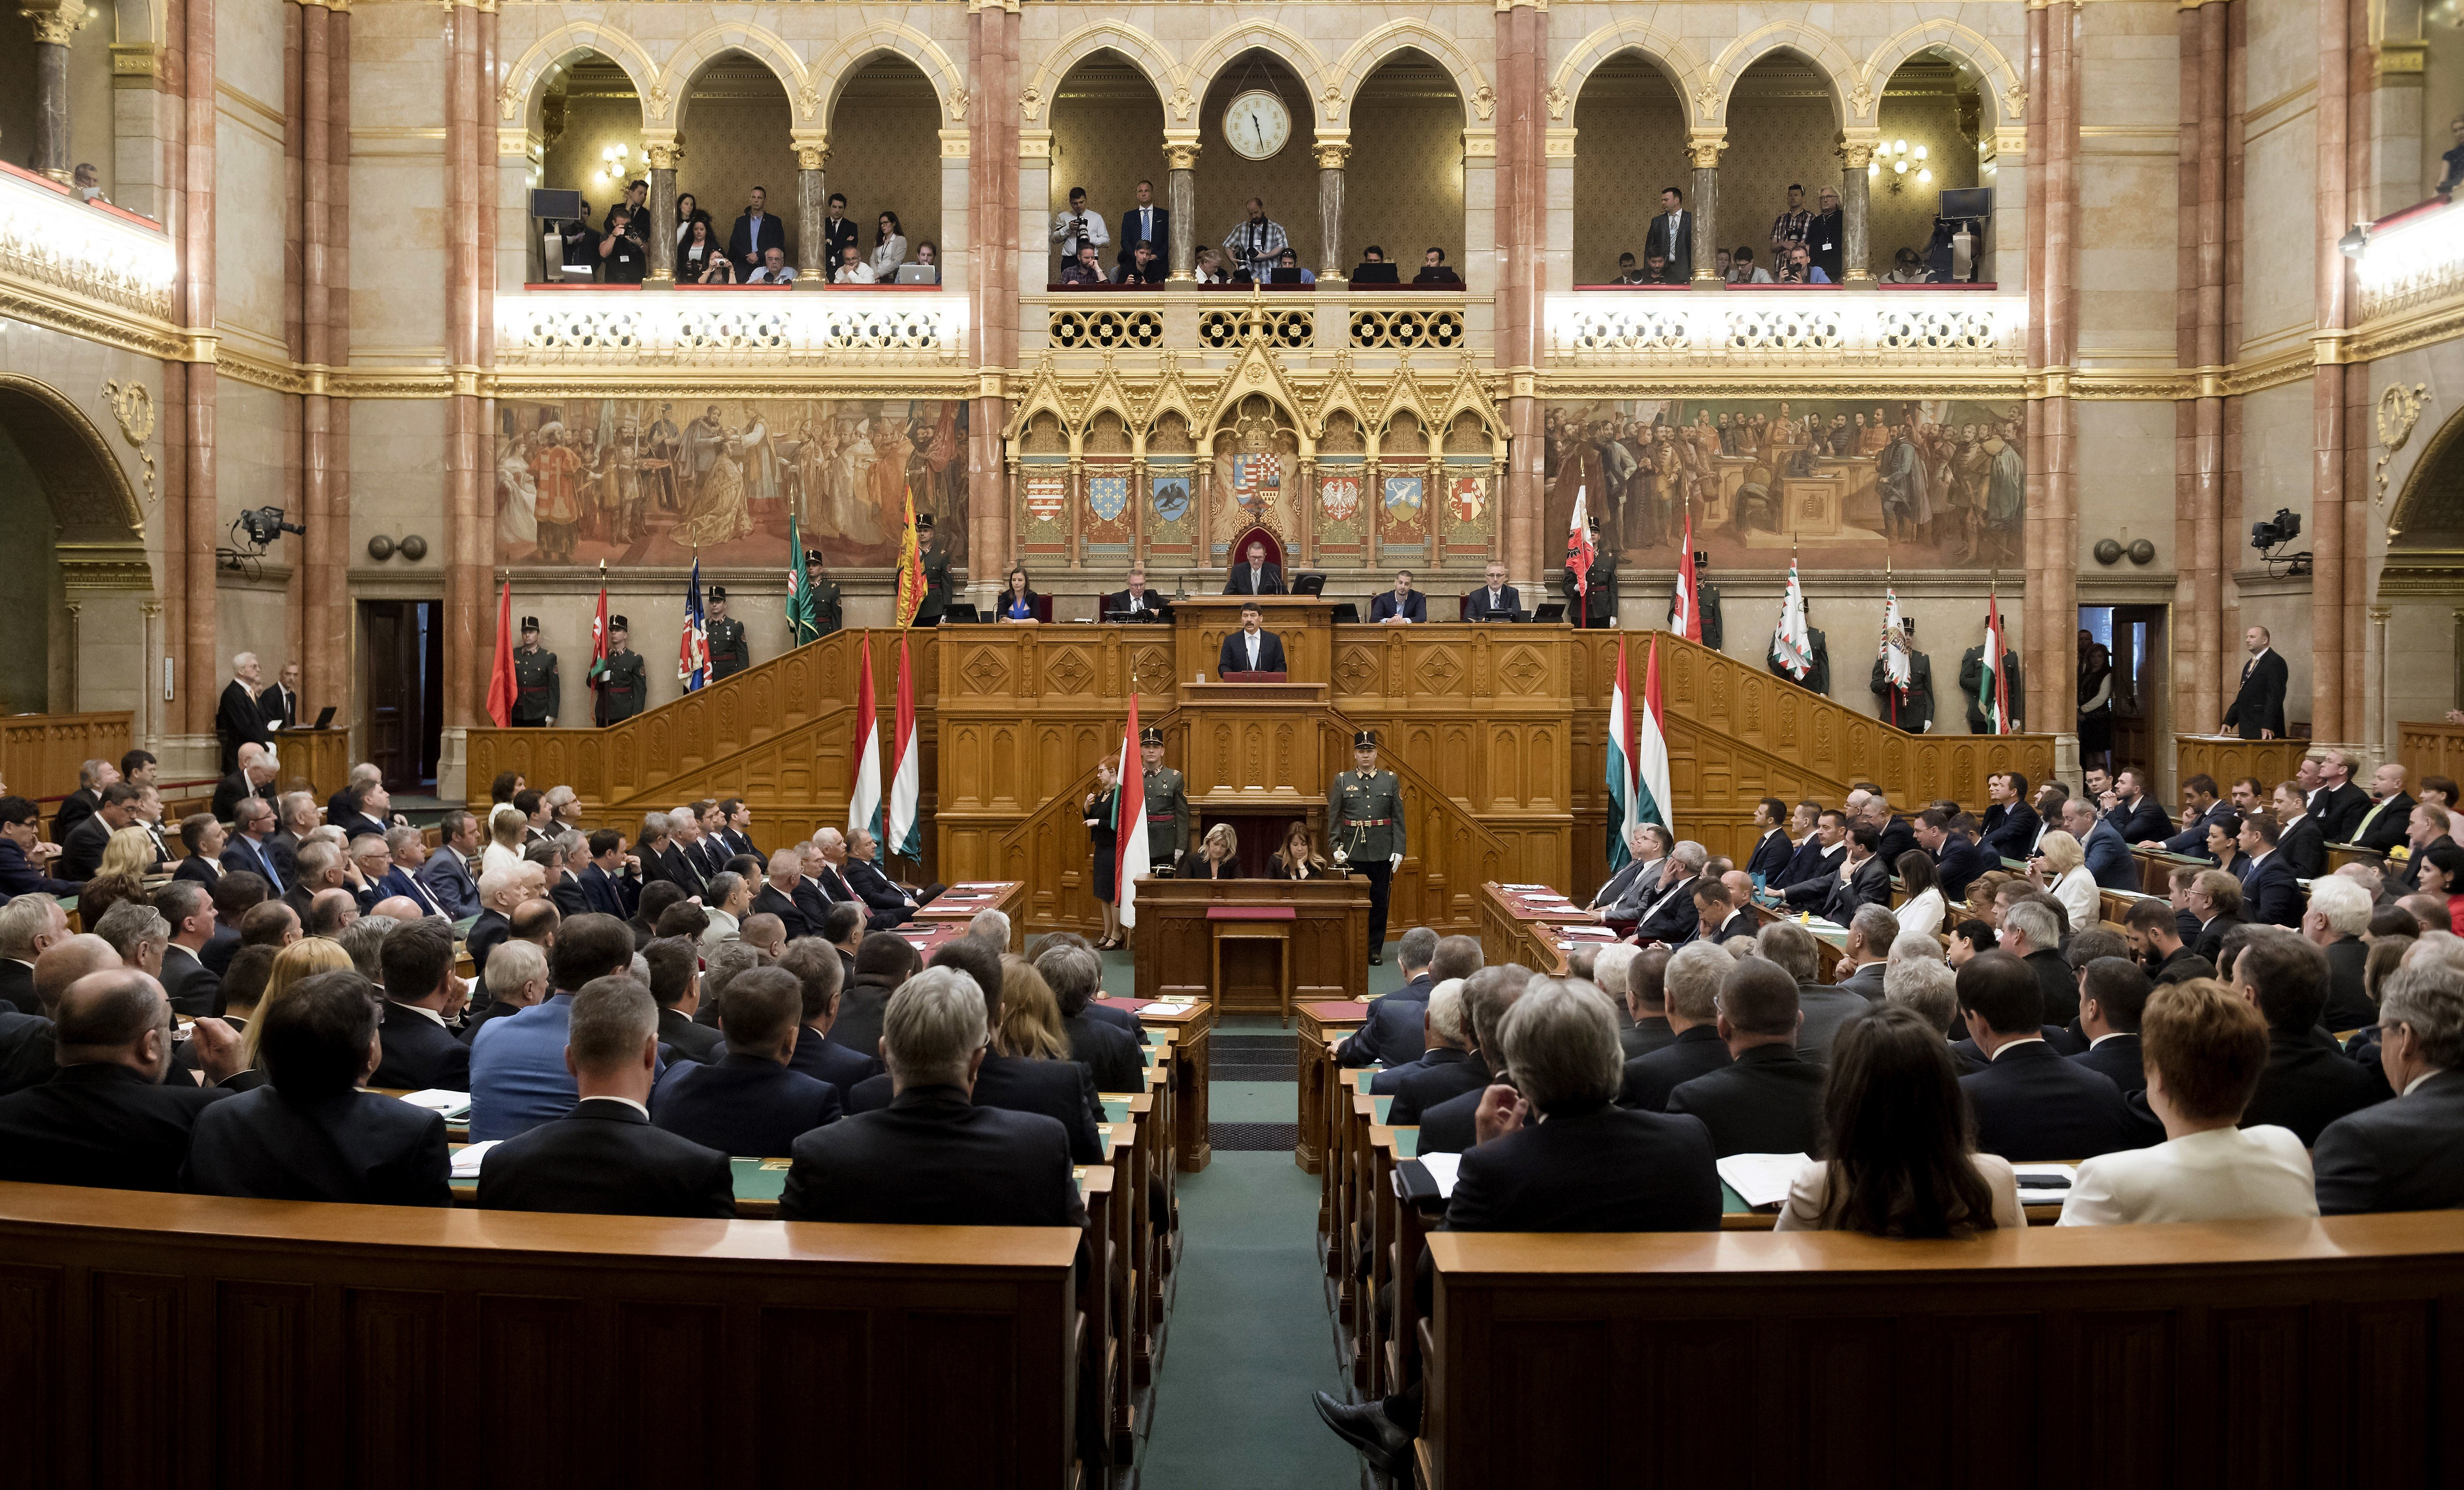 Ungarns neues Parlament – Protest und Amtseid am Dienstag post's picture